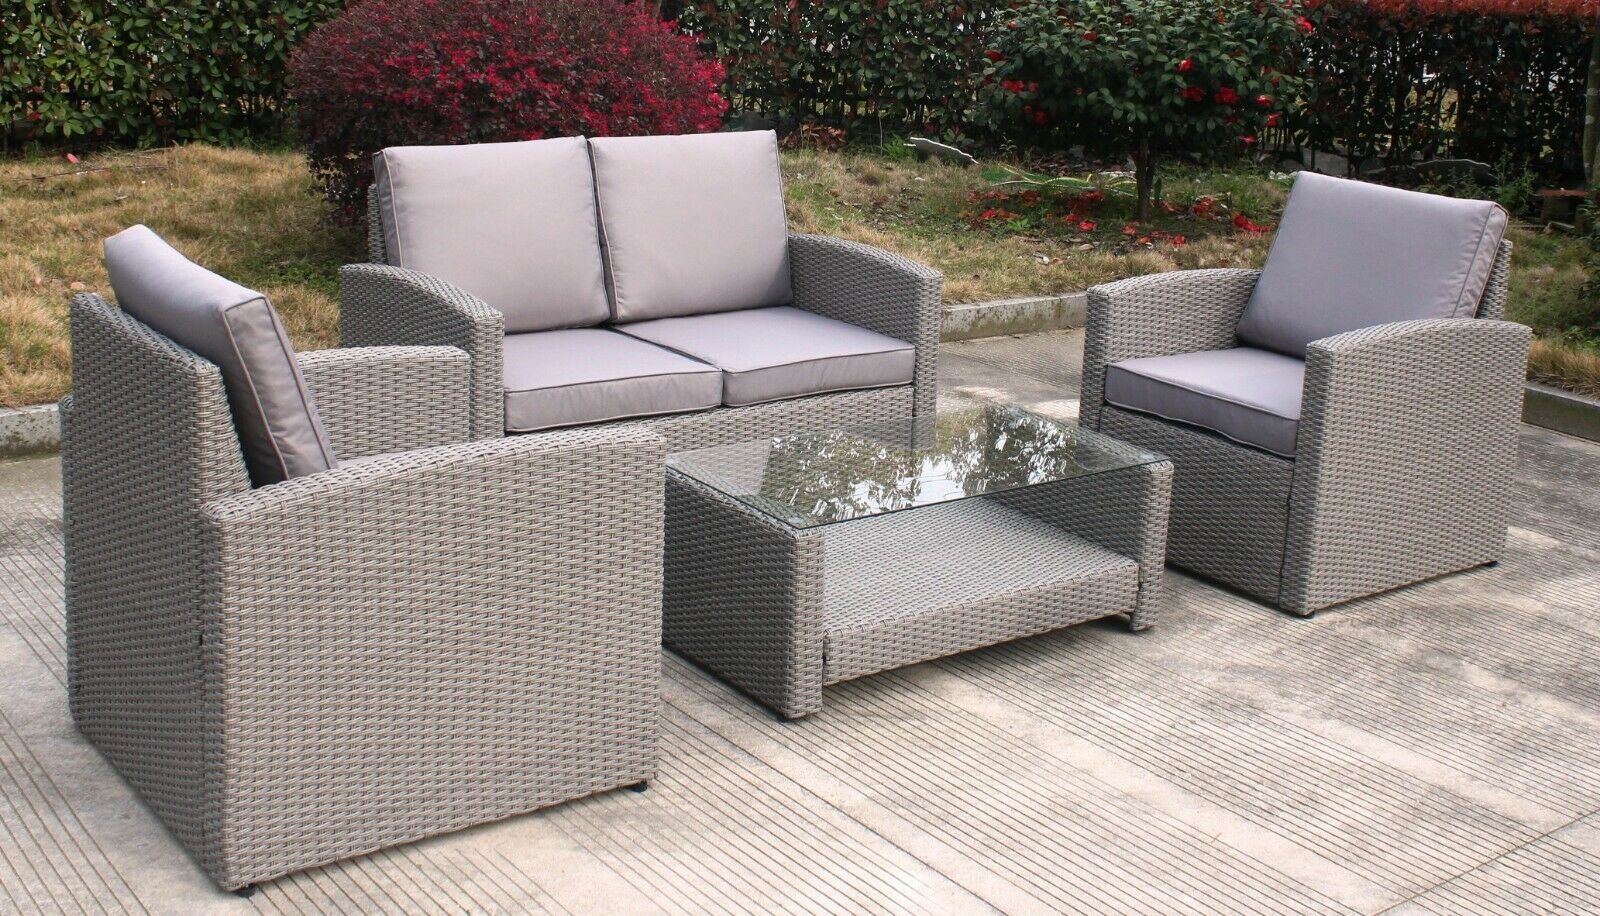 Garden Furniture - Outdoor Sofa Set Grey Rattan Wicker Garden Furniture 4 Piece Chairs Table Sofa